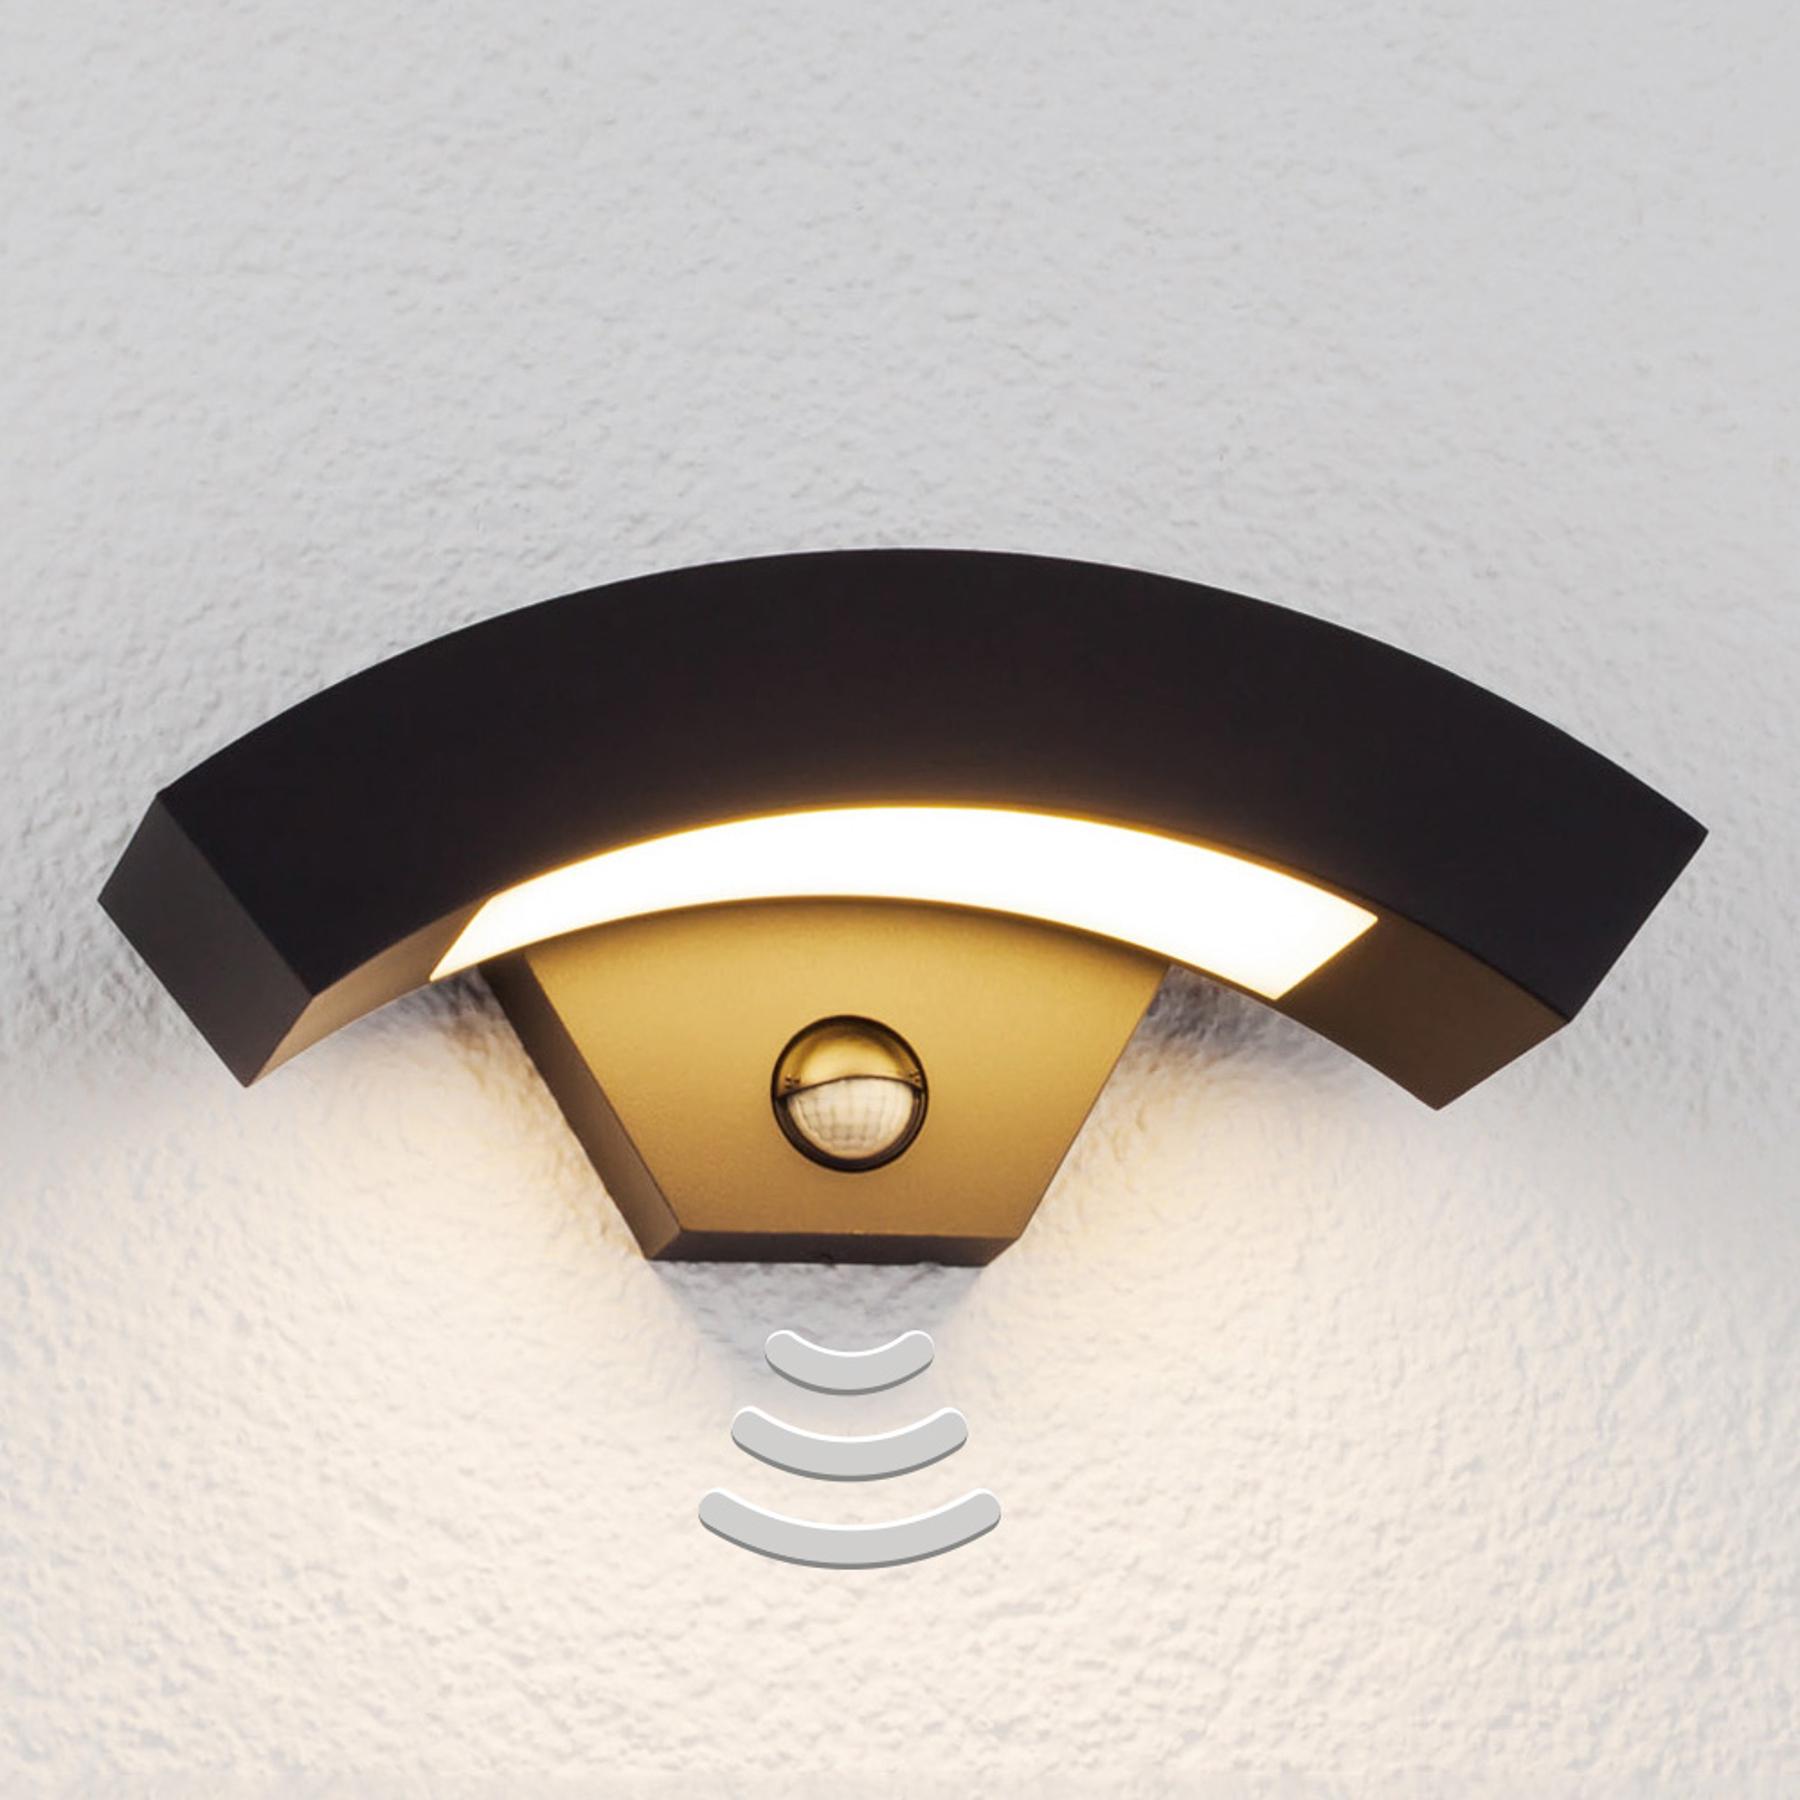 Lennik - LED-buitenwandlamp met bewegingssensor